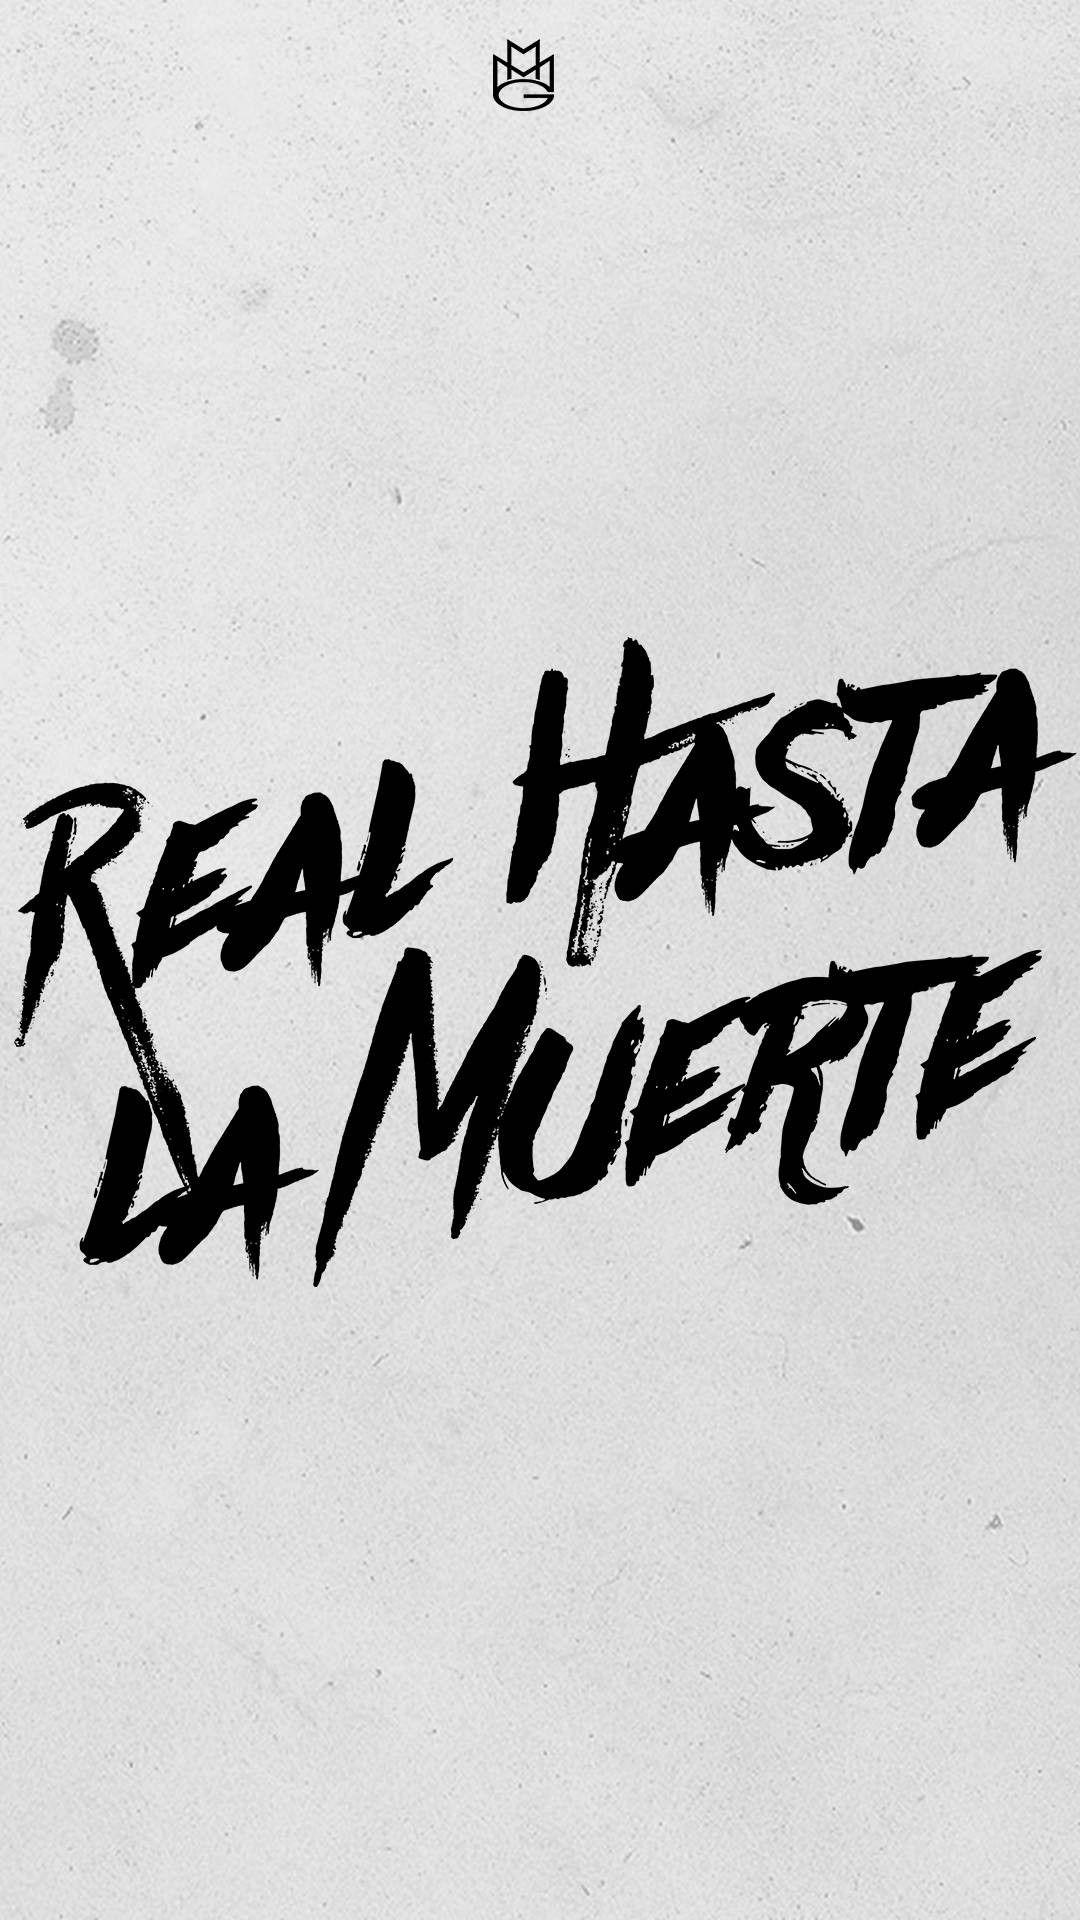 REAL HASTA LA MUERTE VINYL STICKER